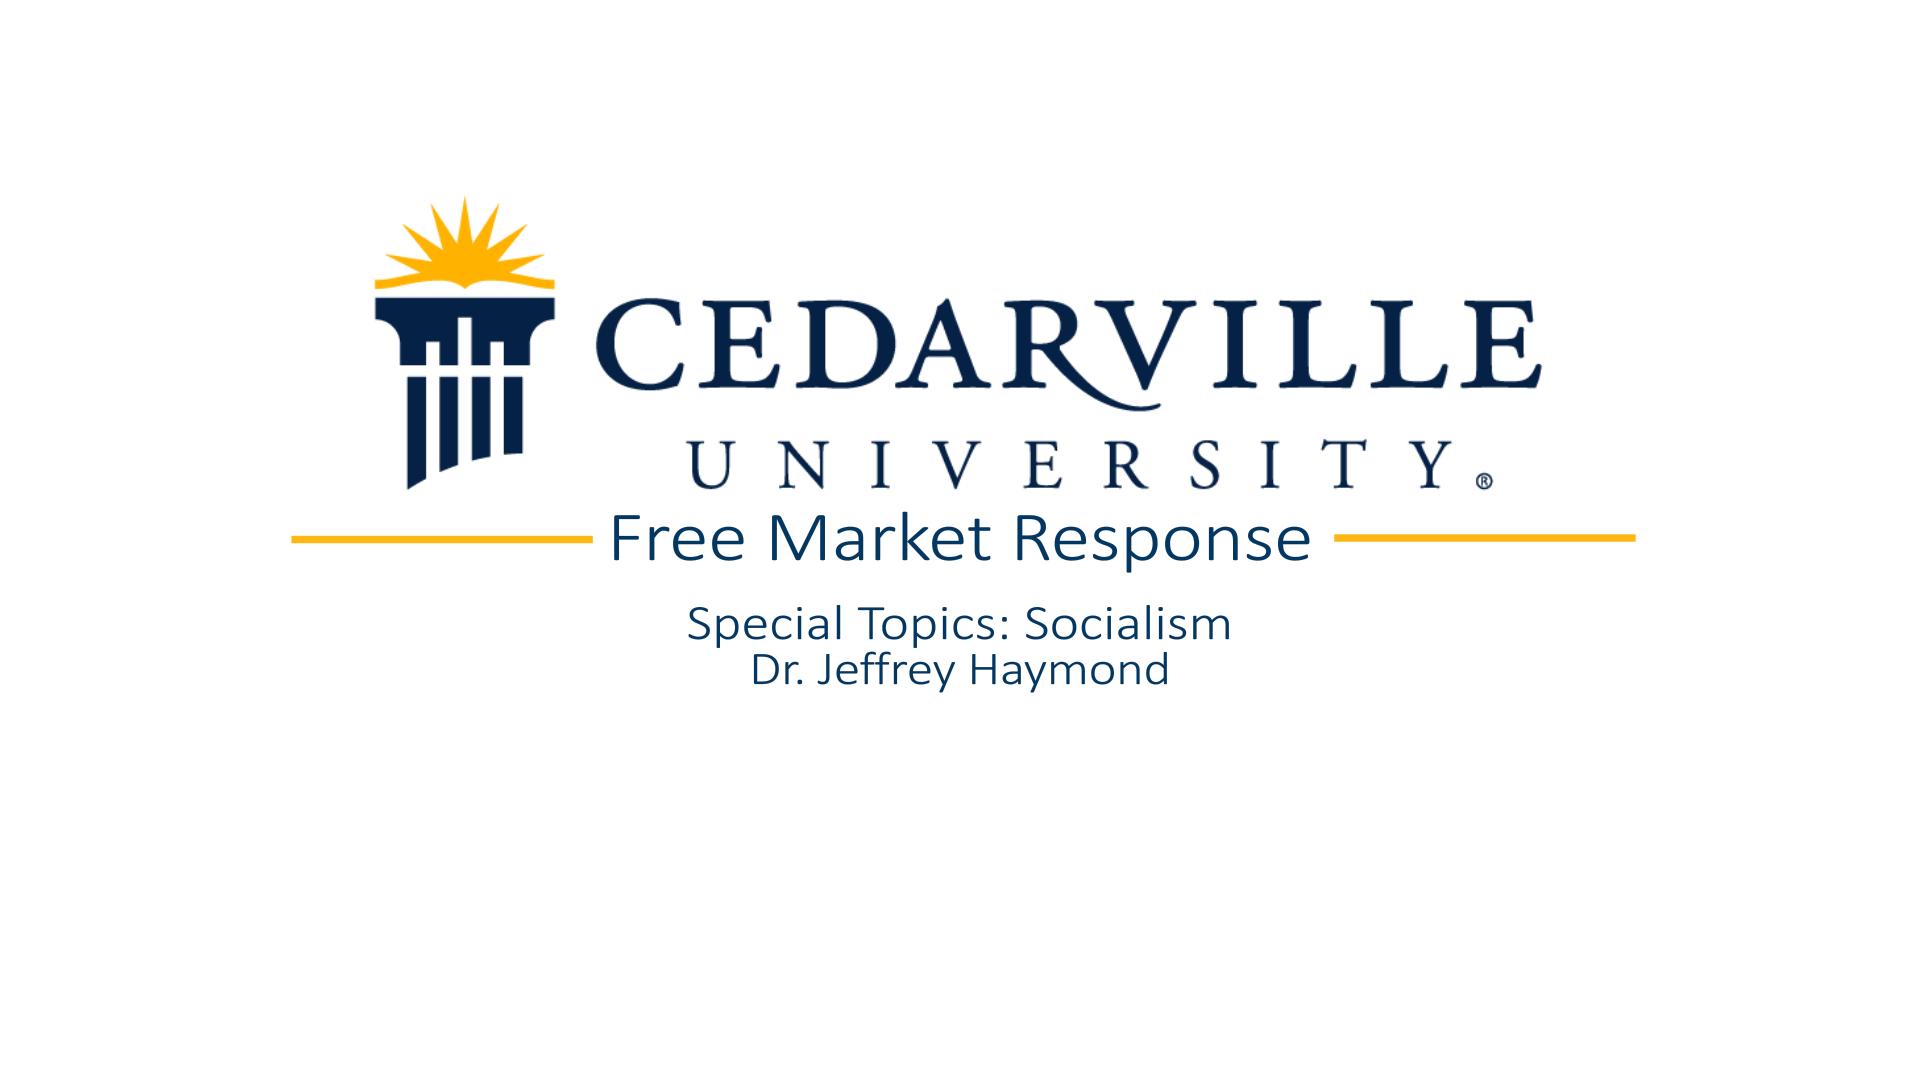 View thumbnail for Free Market Response